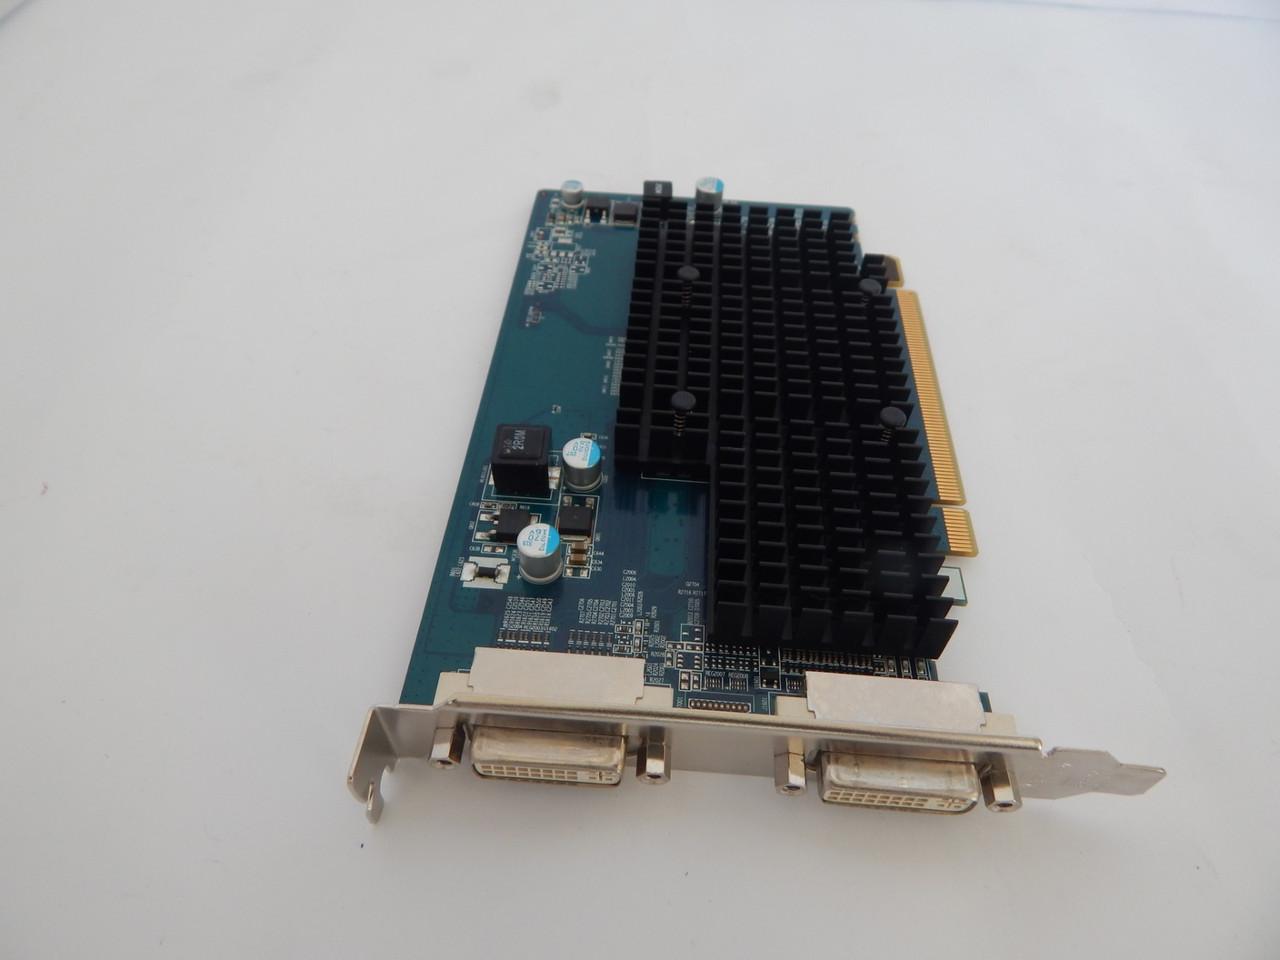 ВИДЕОКАРТА Radeon hd 7350 1 GB 128bit GDDR3 б/у с Европы